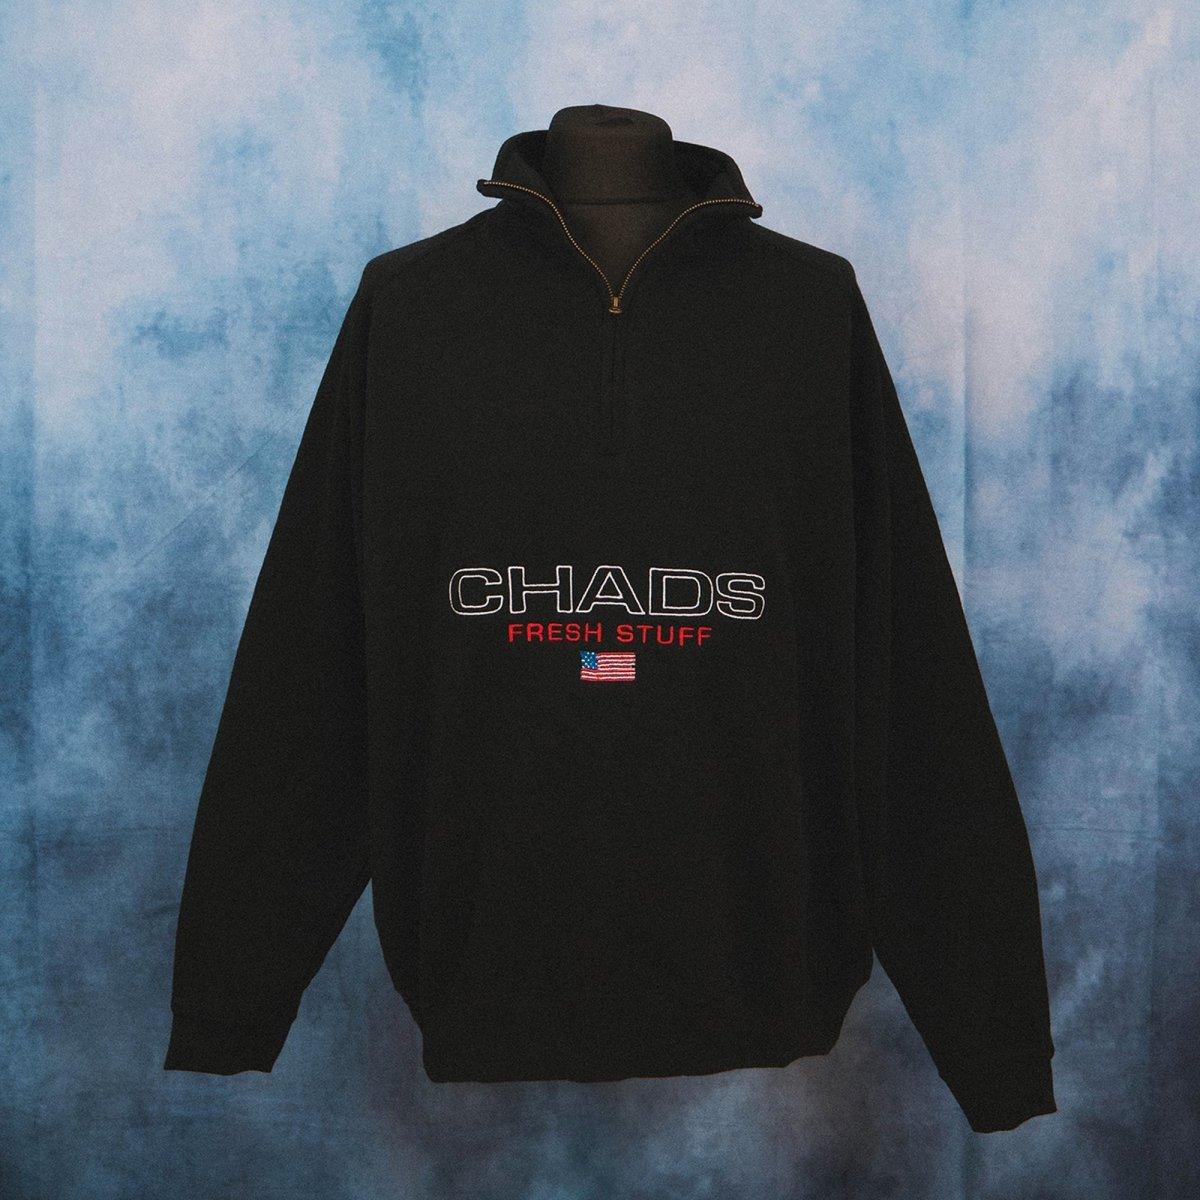 Chads Black Unisex Embroidered 1/4 Zip Sweater